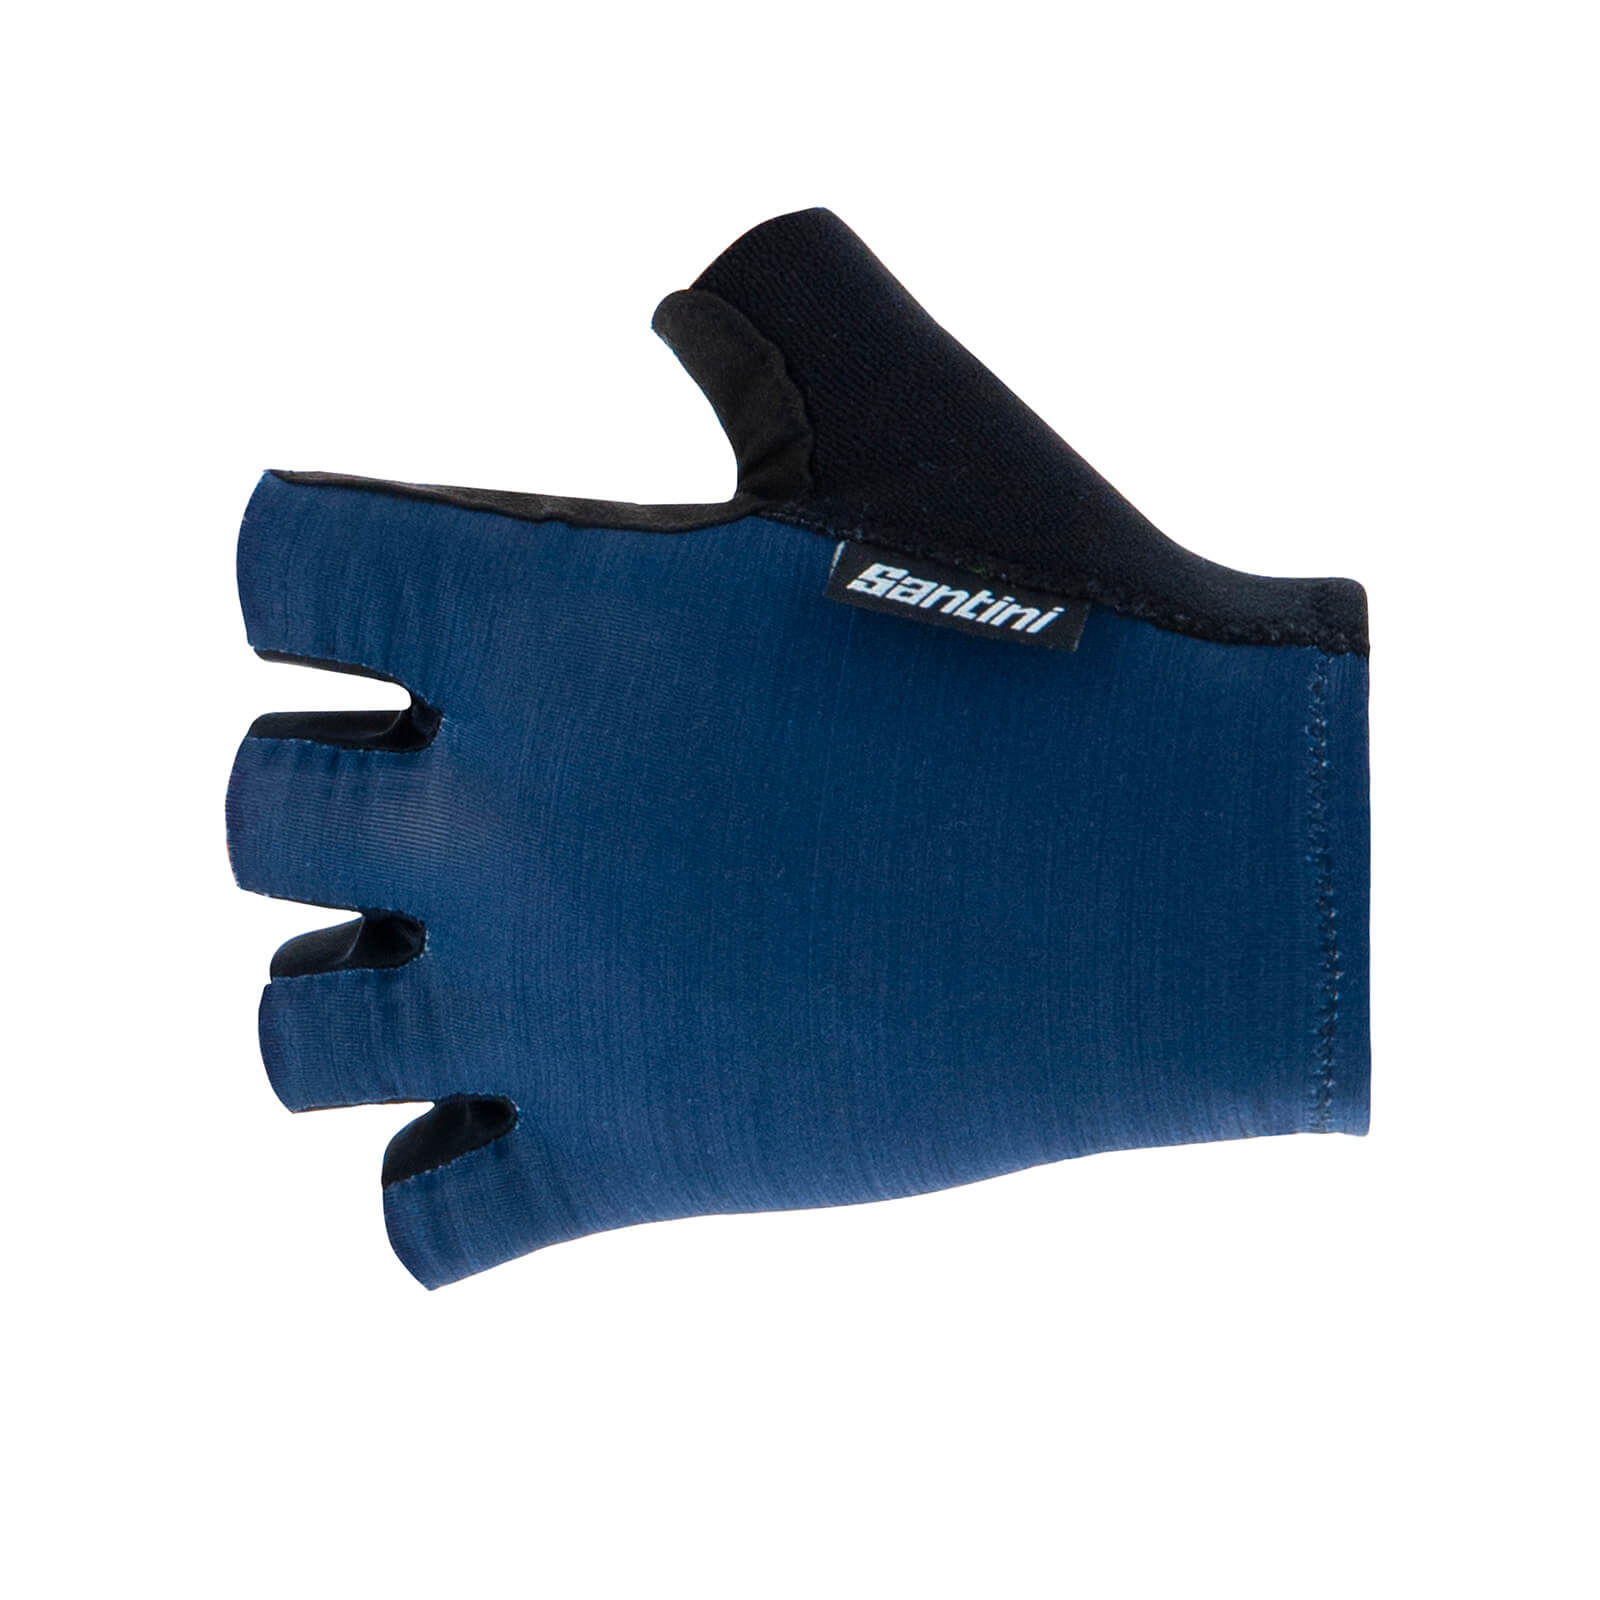 Santini Cubo Gloves - M - Nautica Blue